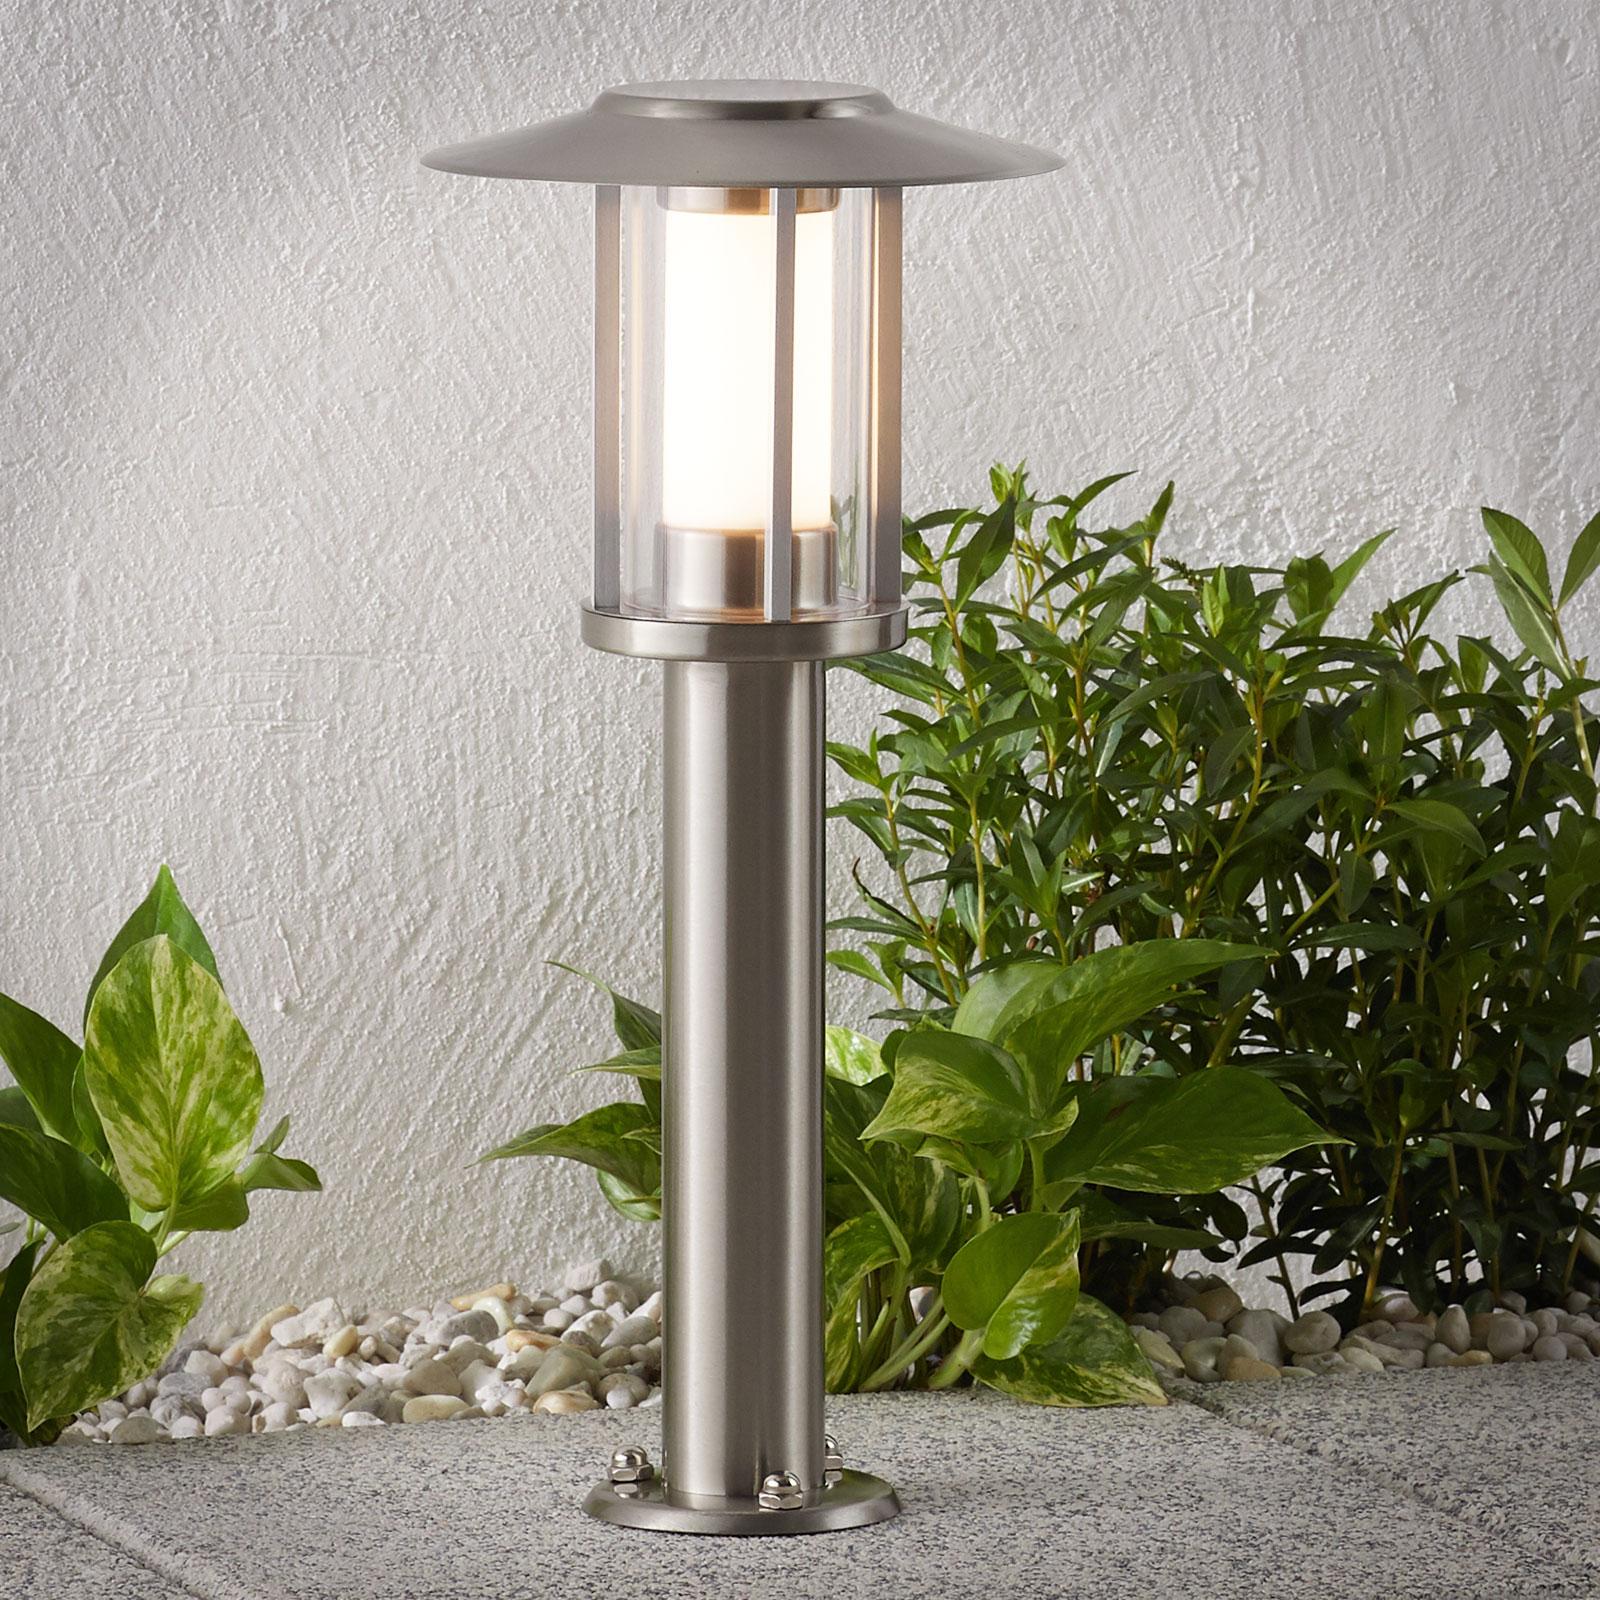 LED-Sockellampe Gregory, Edelstahl